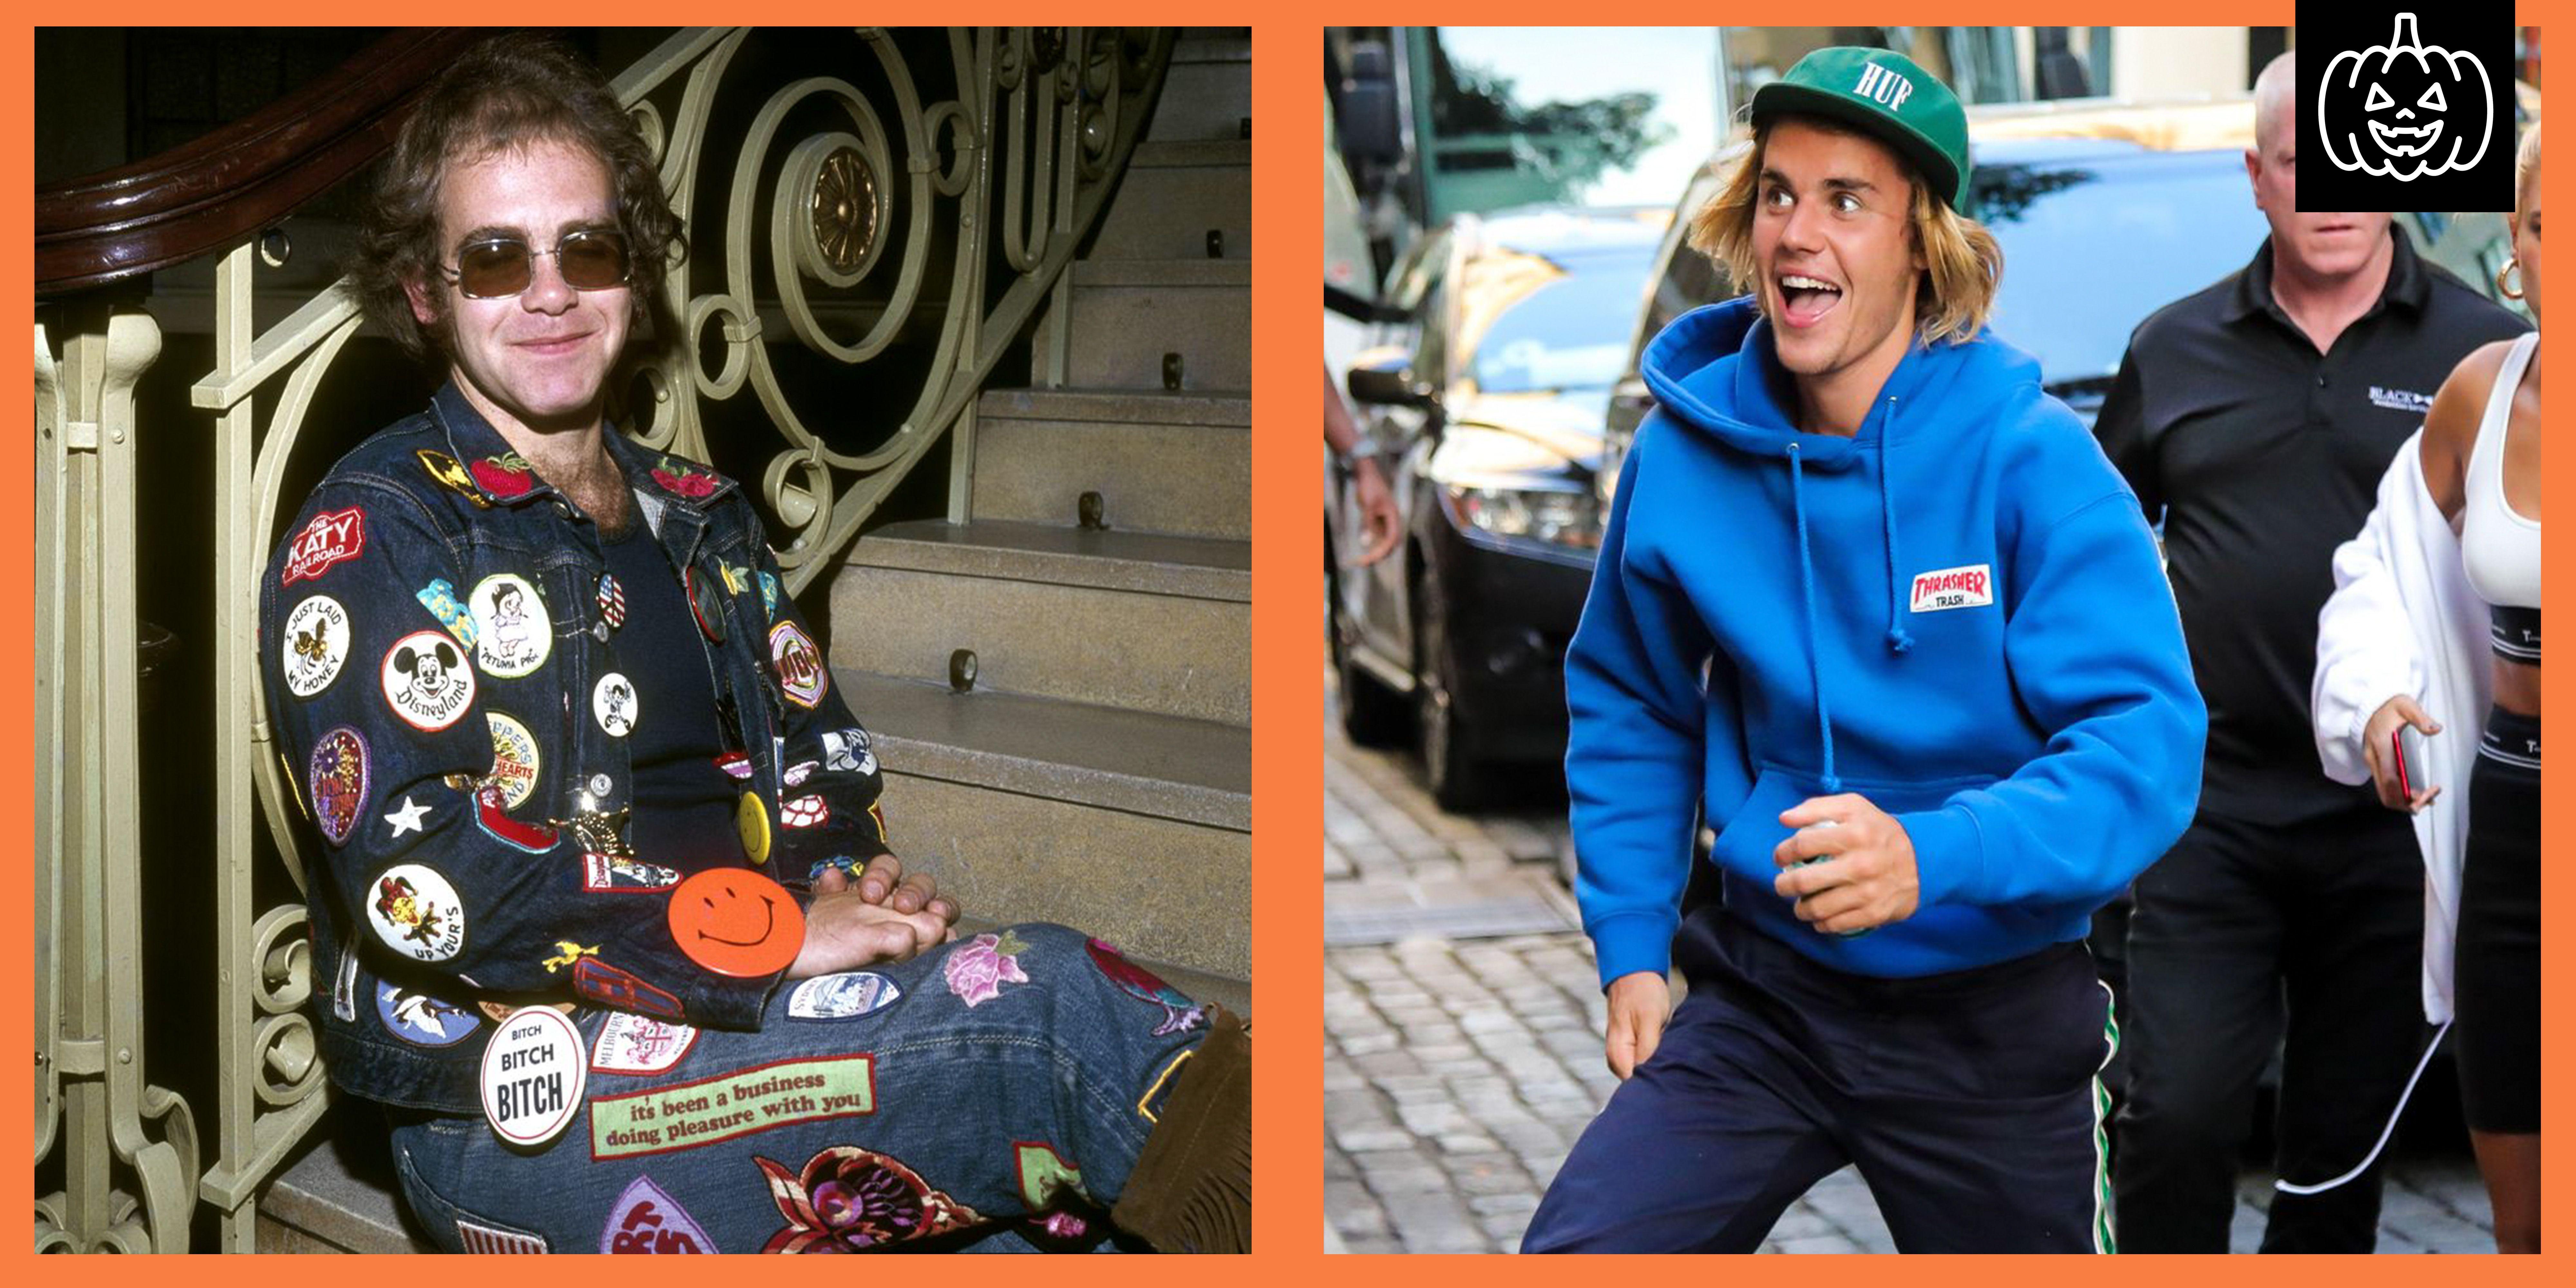 16 Best Last,Minute Halloween Costume Ideas for Men 2019